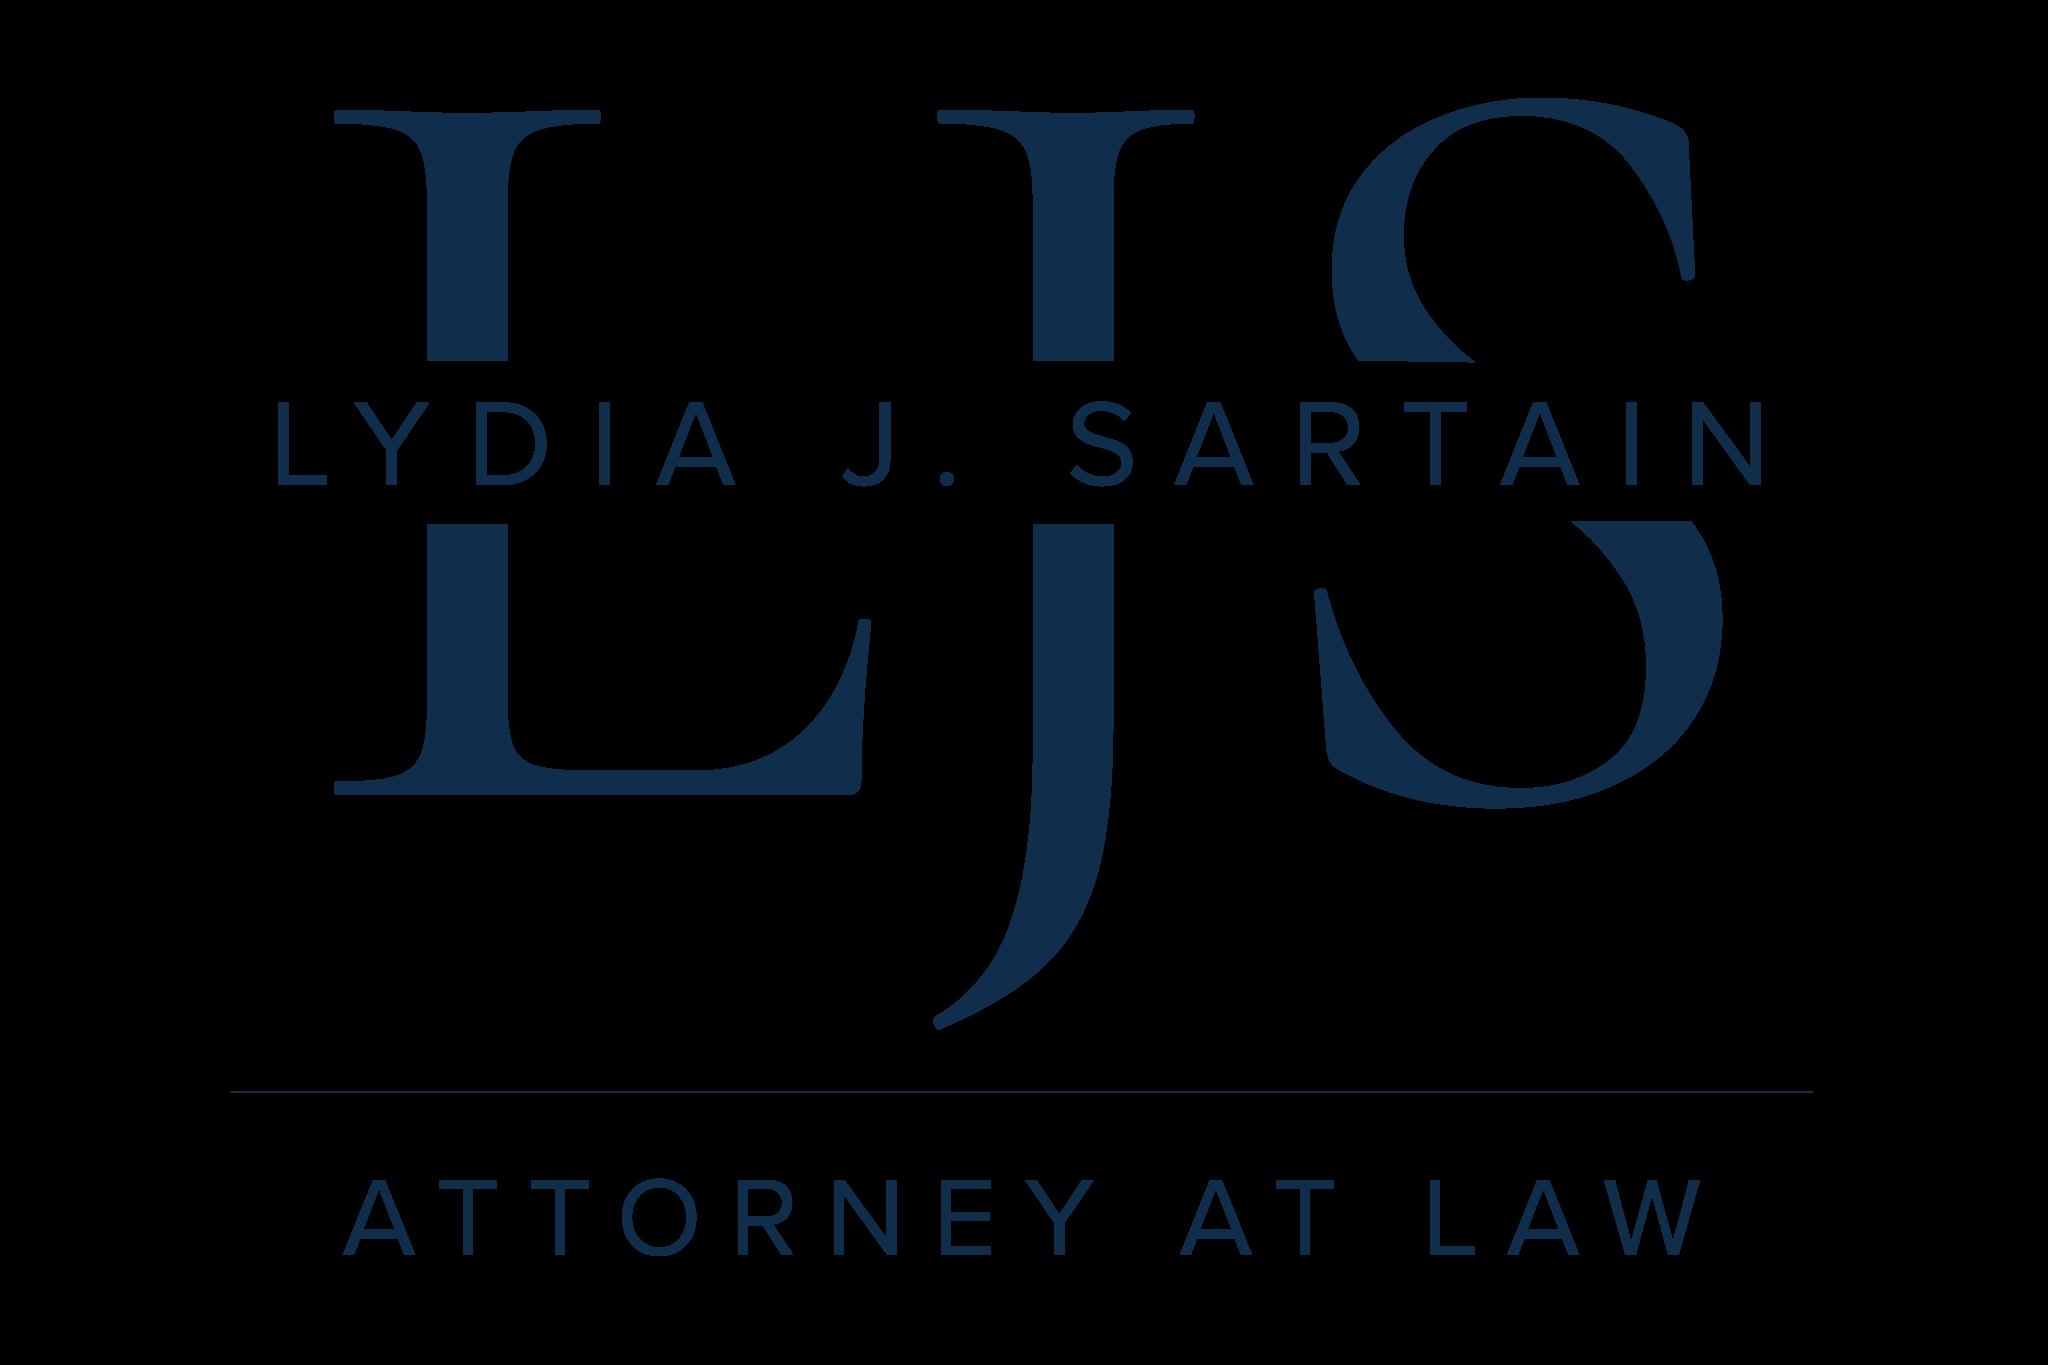 Lydia Sartain